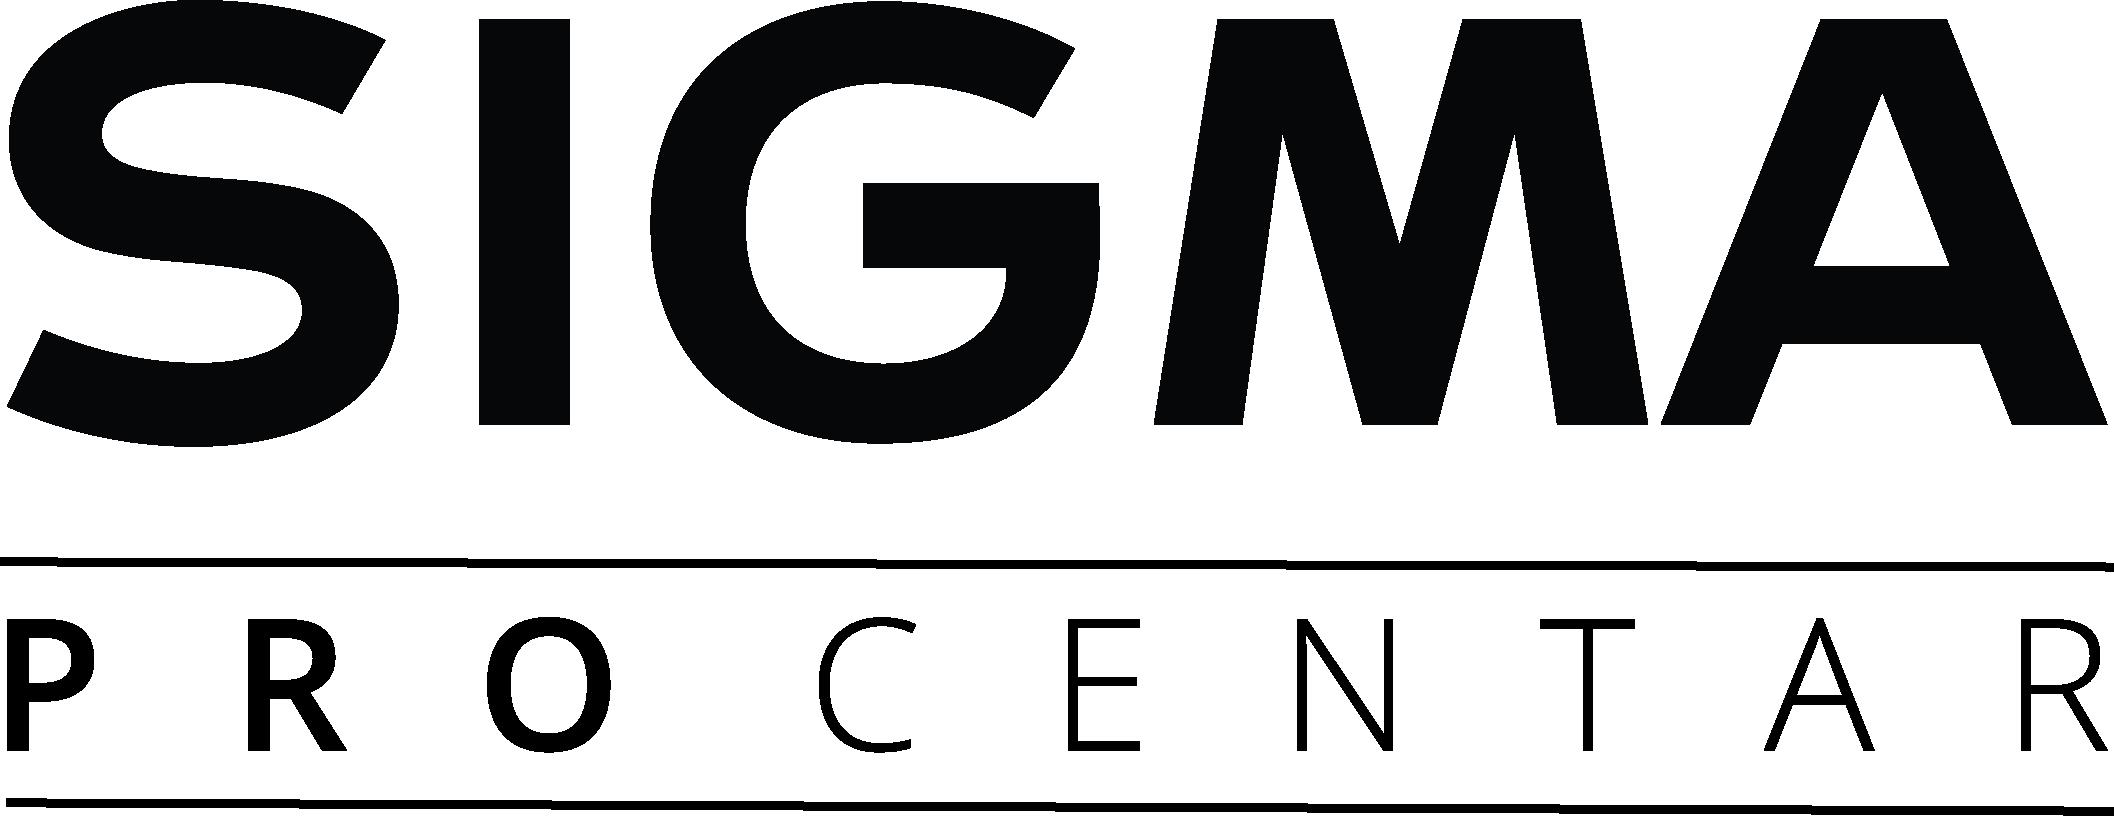 Sigma Pro Centar SPC